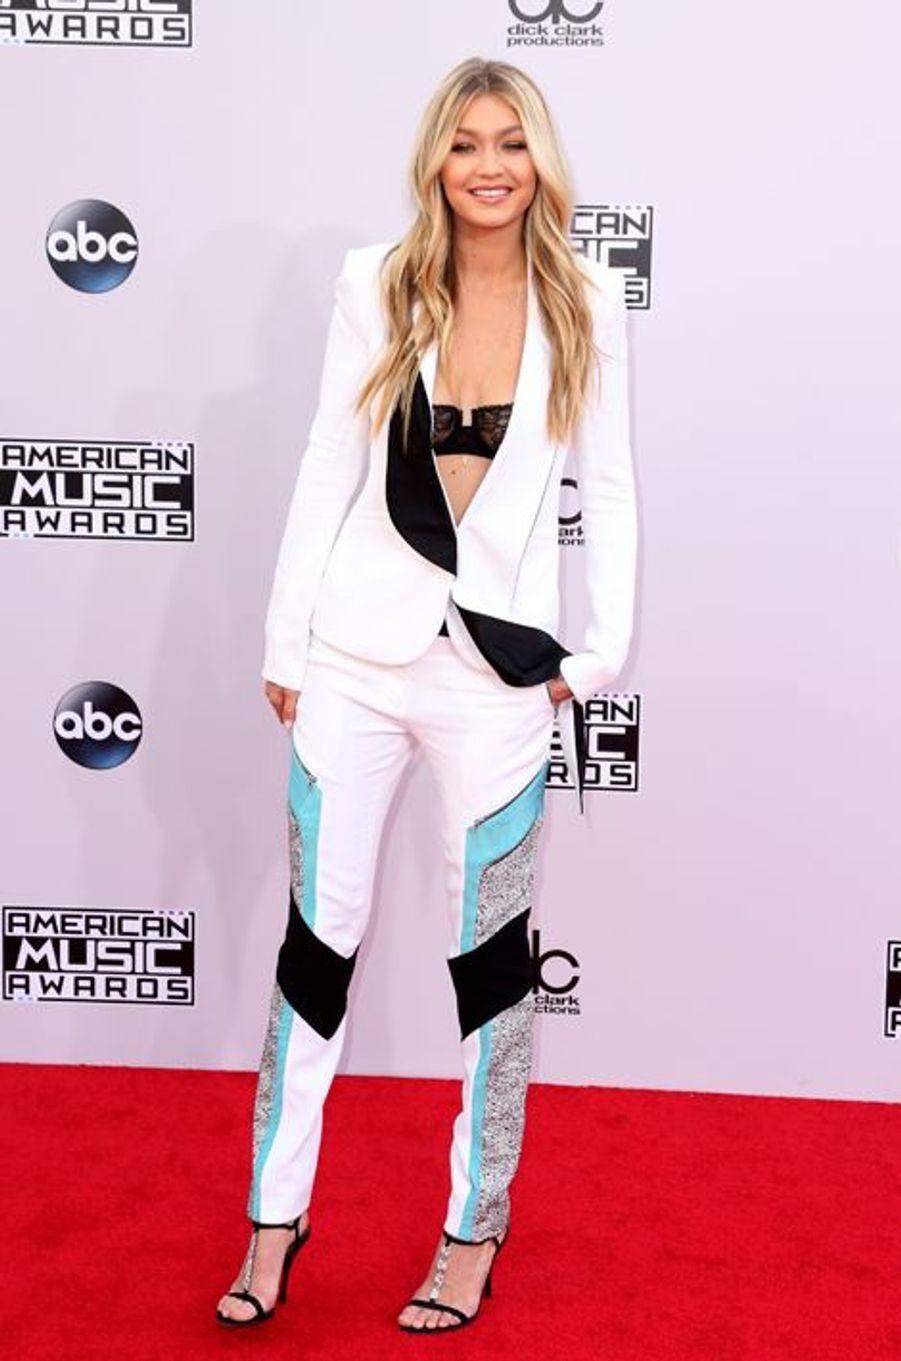 Gigi Hadid, nouvelle icône mode aux derniers American Music Awards